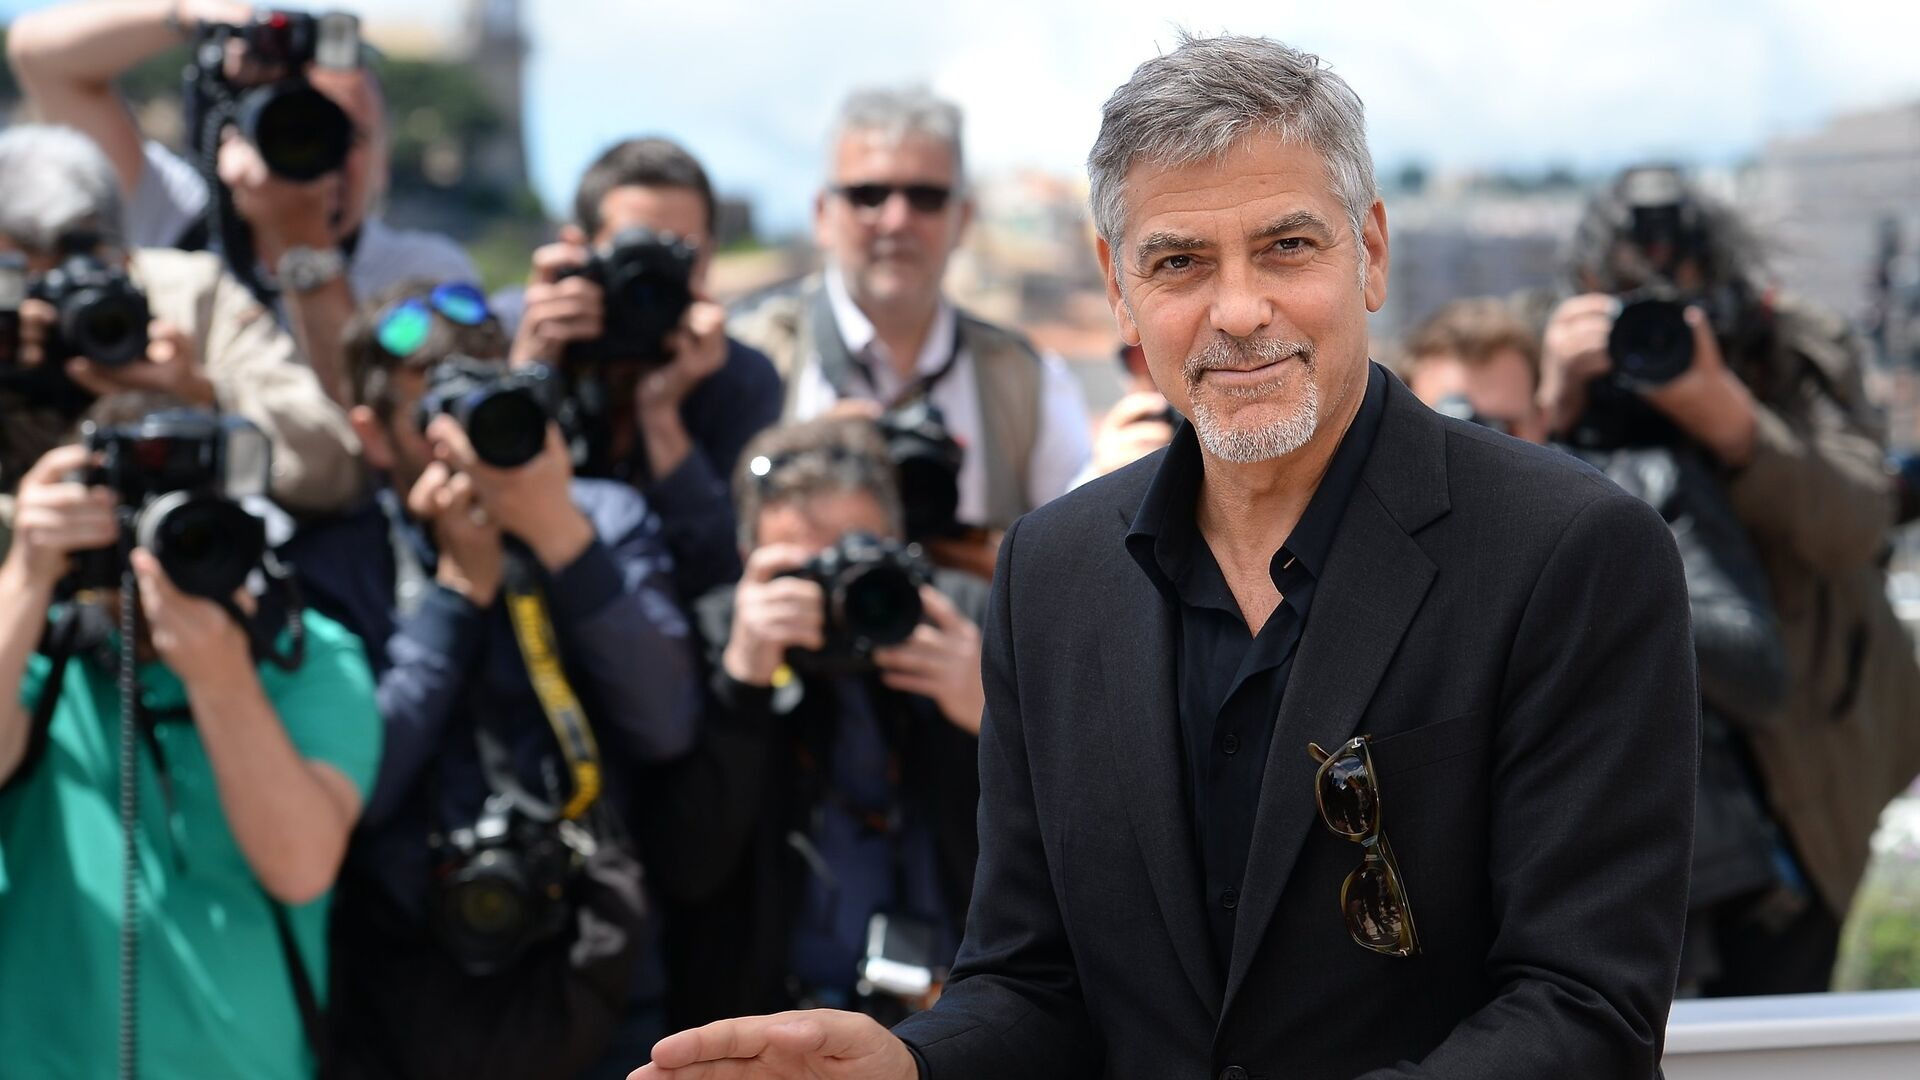 Актер Джордж Клуни - РИА Новости, 1920, 22.12.2020